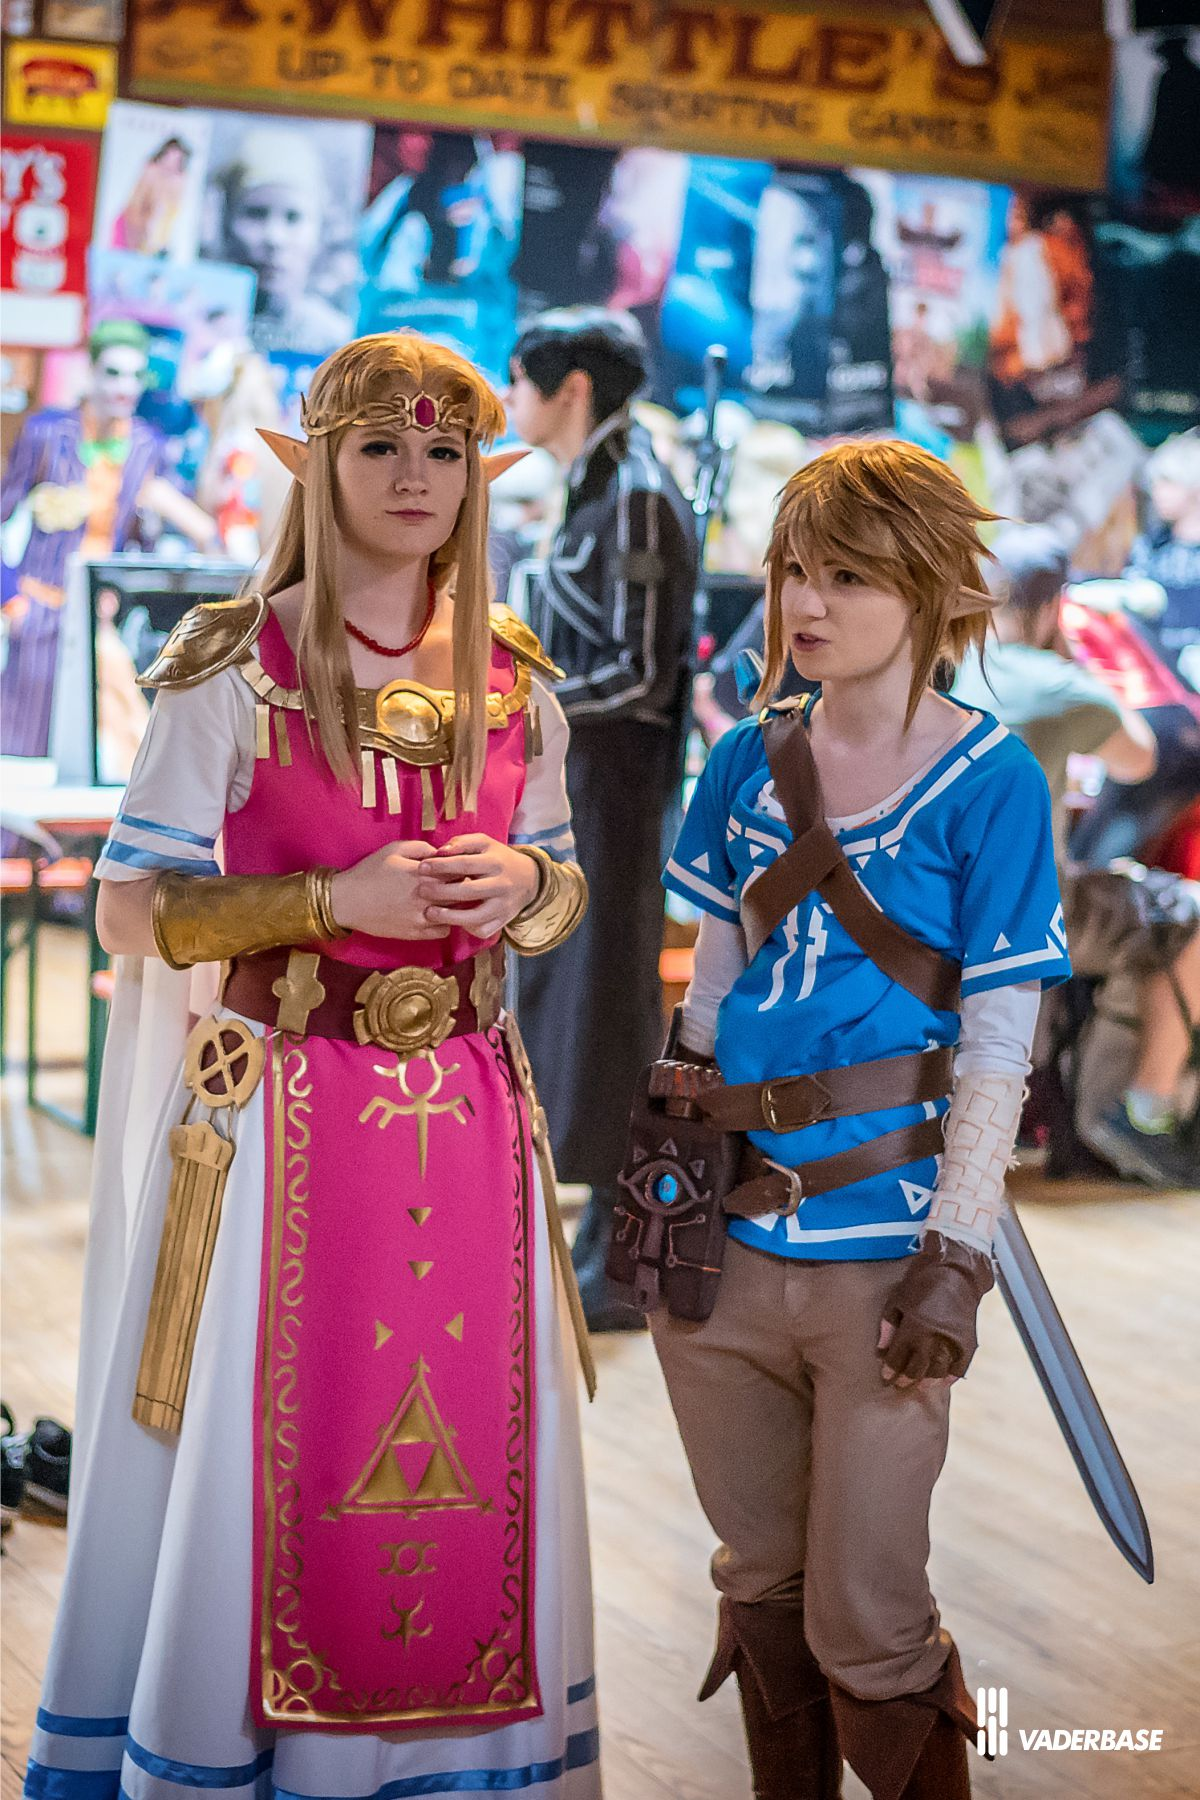 cosplay_day_movie_park_16.jpg